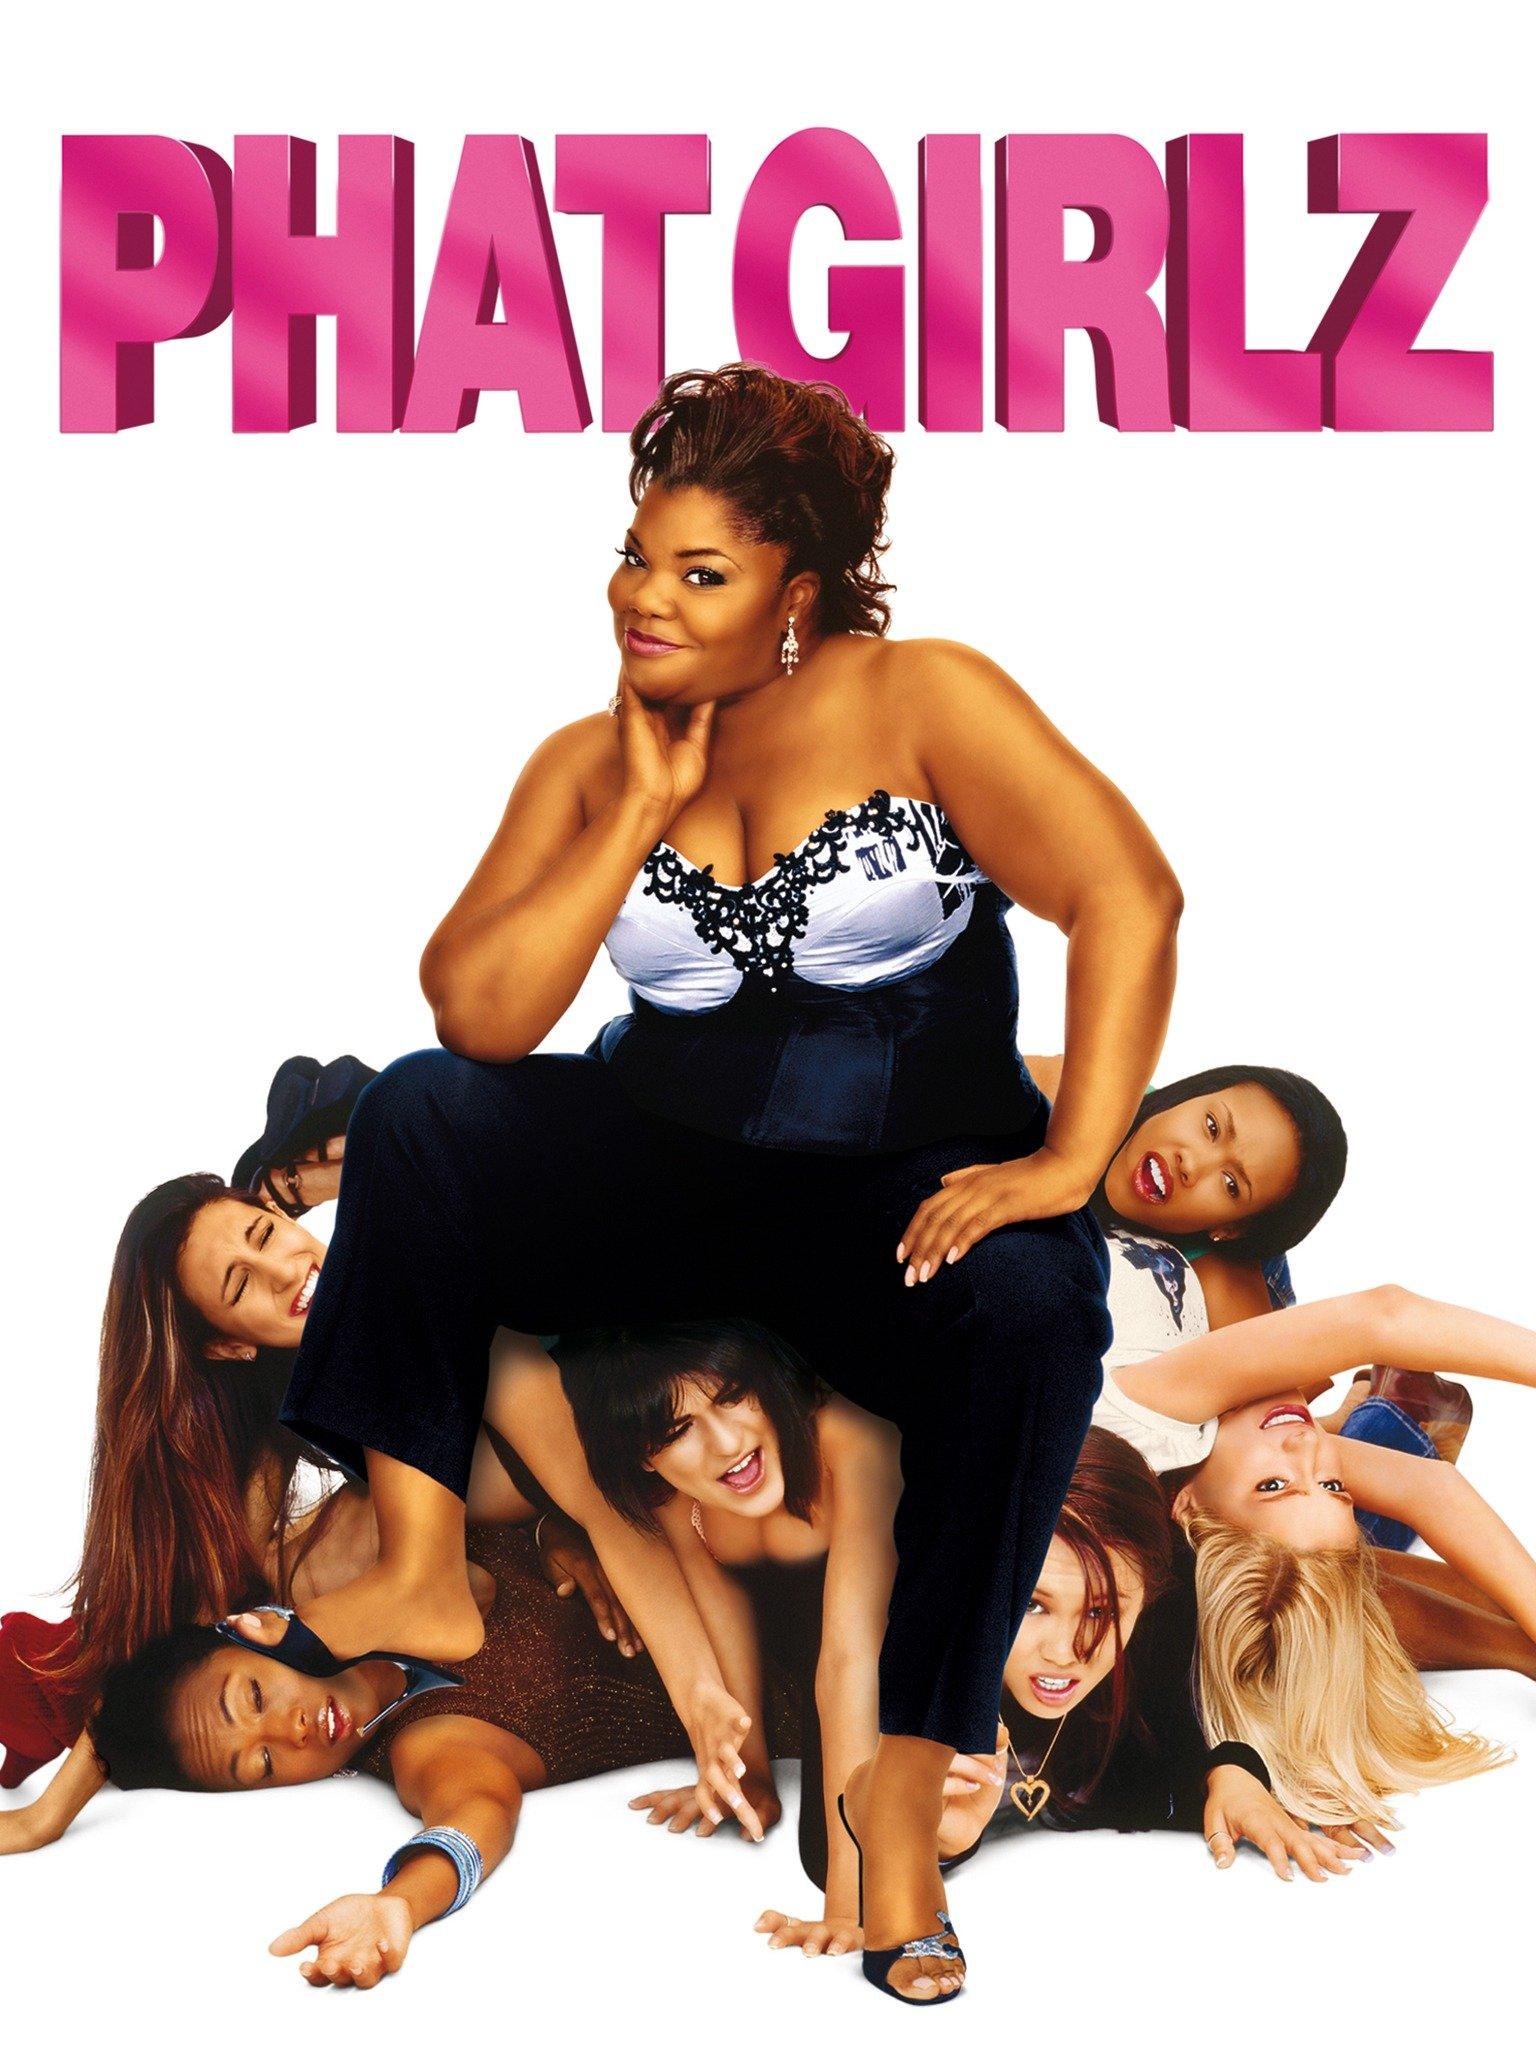 Phat Girlz (2006) - Rotten Tomatoes